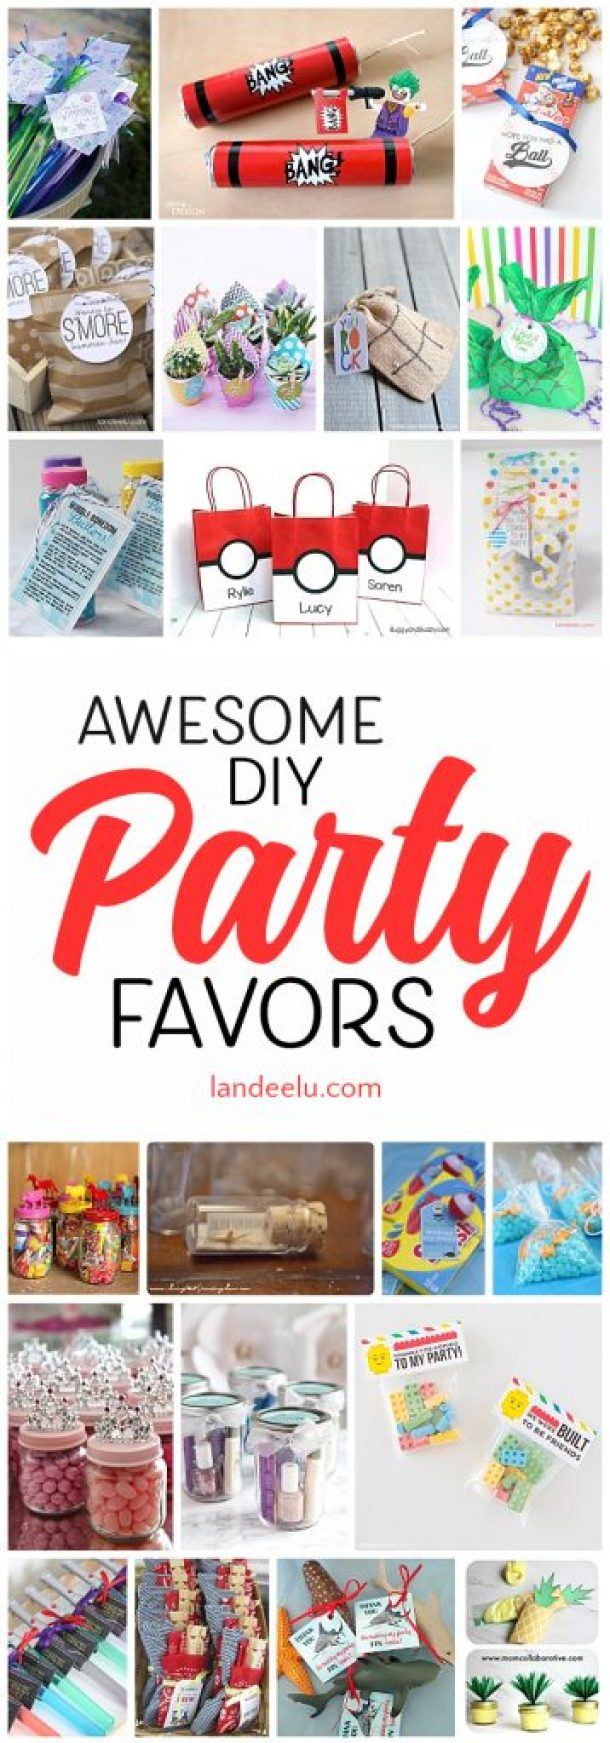 Easy DIY Party Favors Your Guests Will LOVE! - landeelu.com